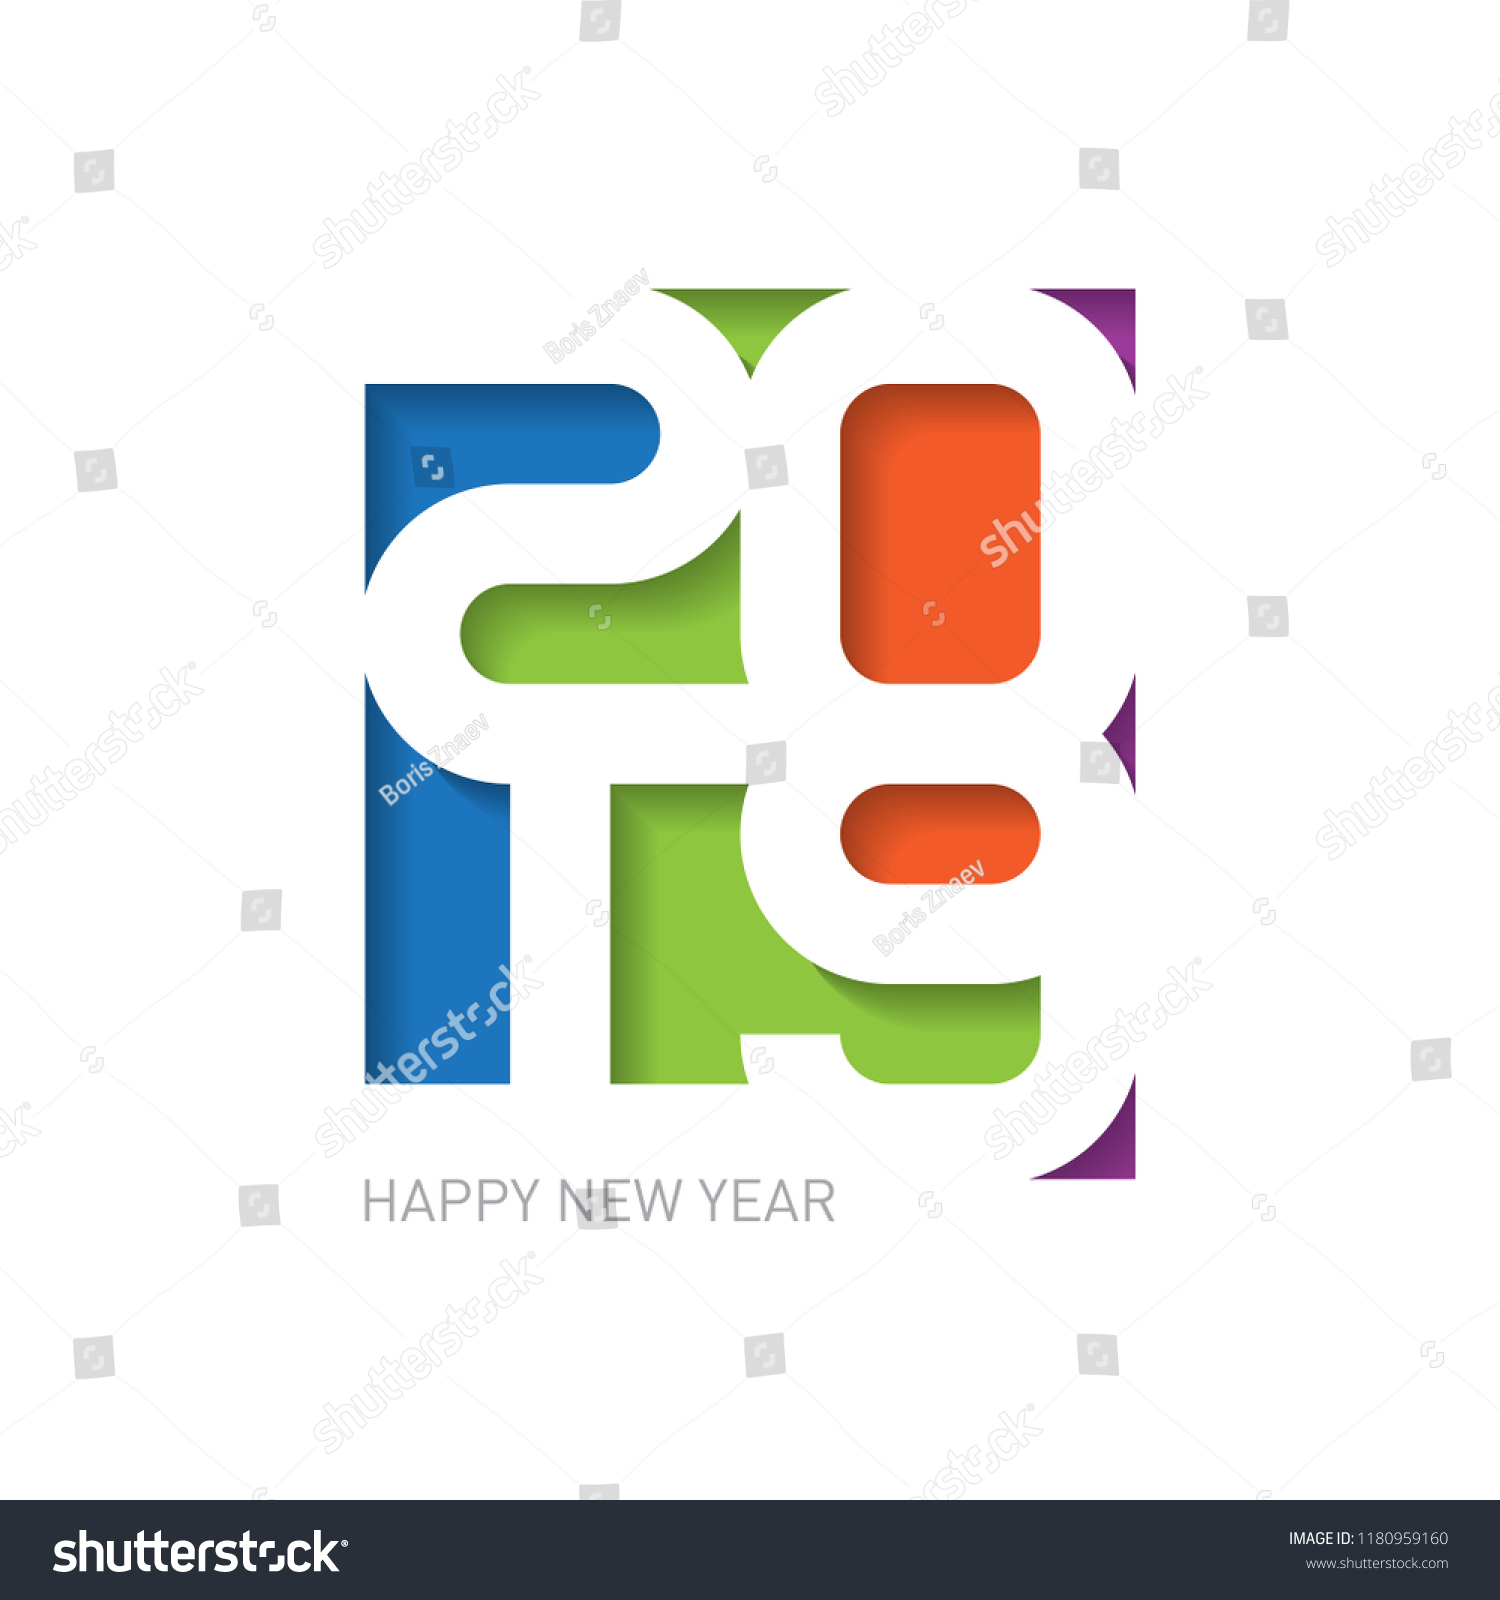 2019 Happy New Year Creative Design Stock Vector Royalty Free